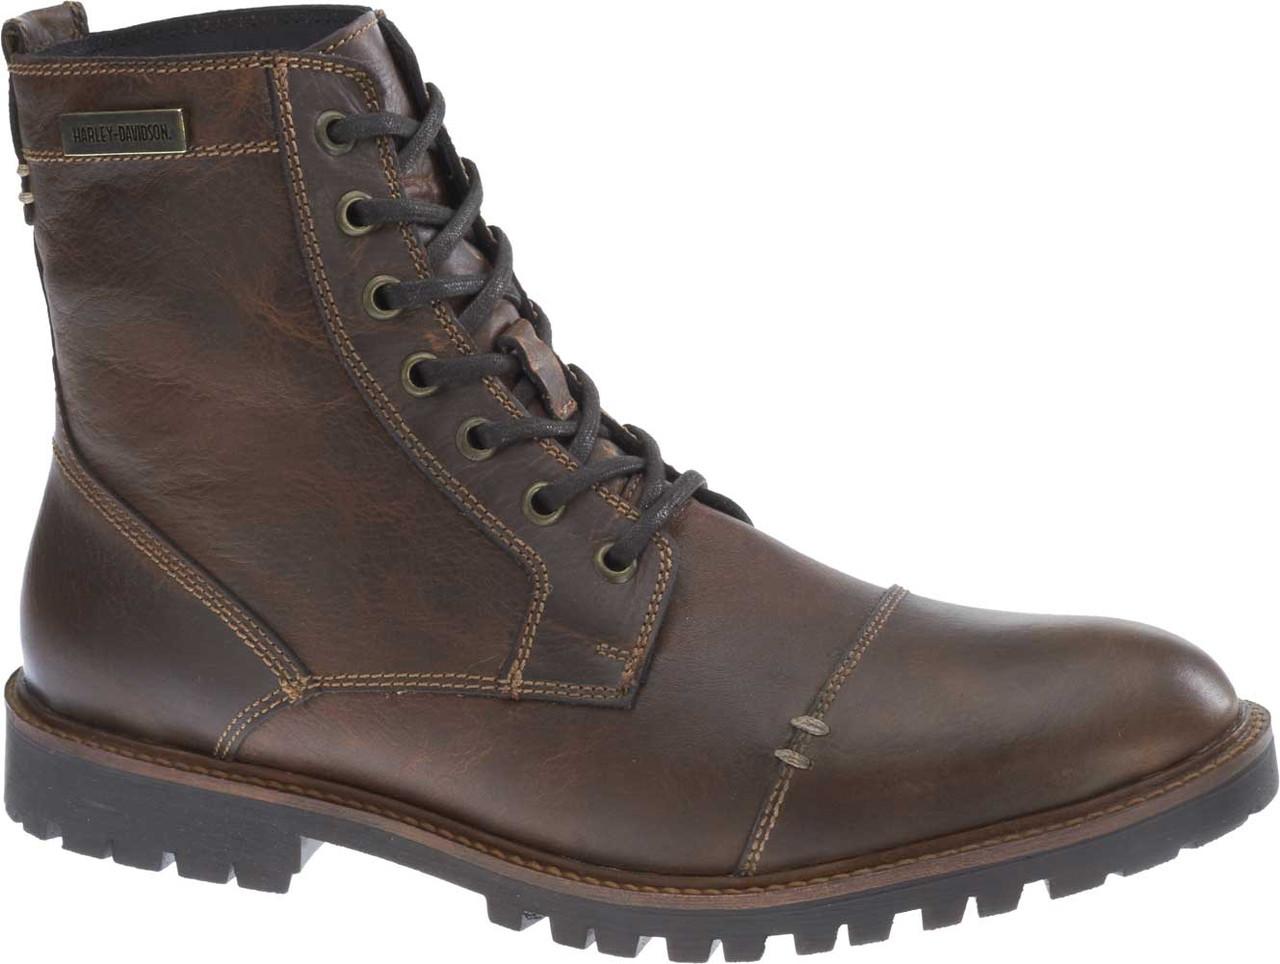 358552fdcef Harley-Davidson® Men's Aldrich 6-Inch Ash Grey or Brown Motorcycle Boots  D93353